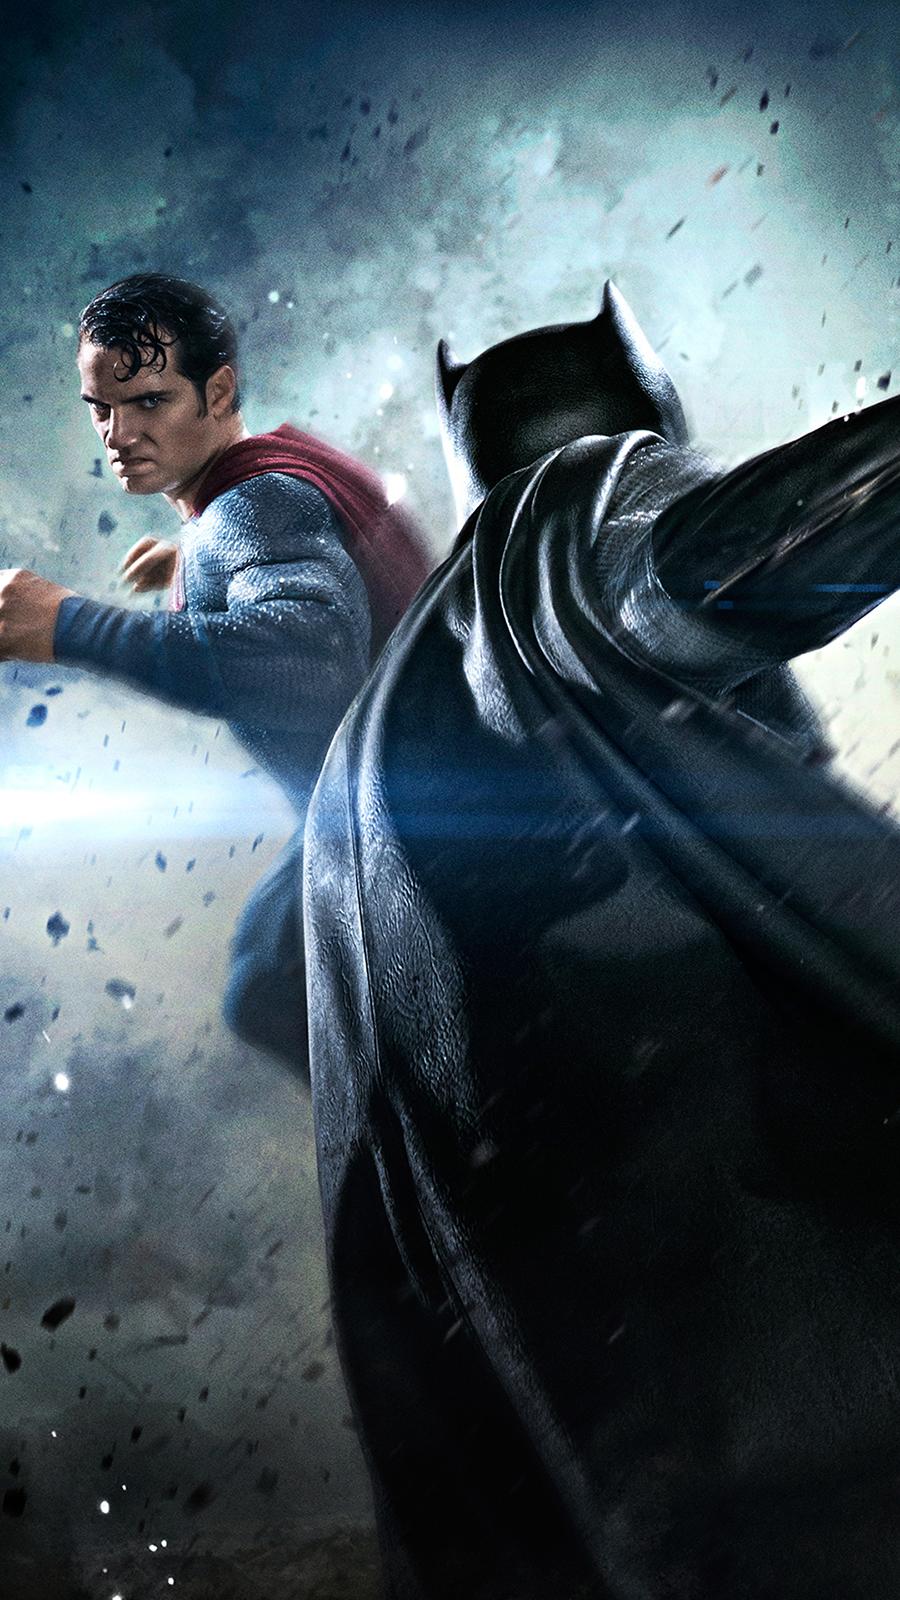 Batman vs Superman Fight Wallpapers Free Download